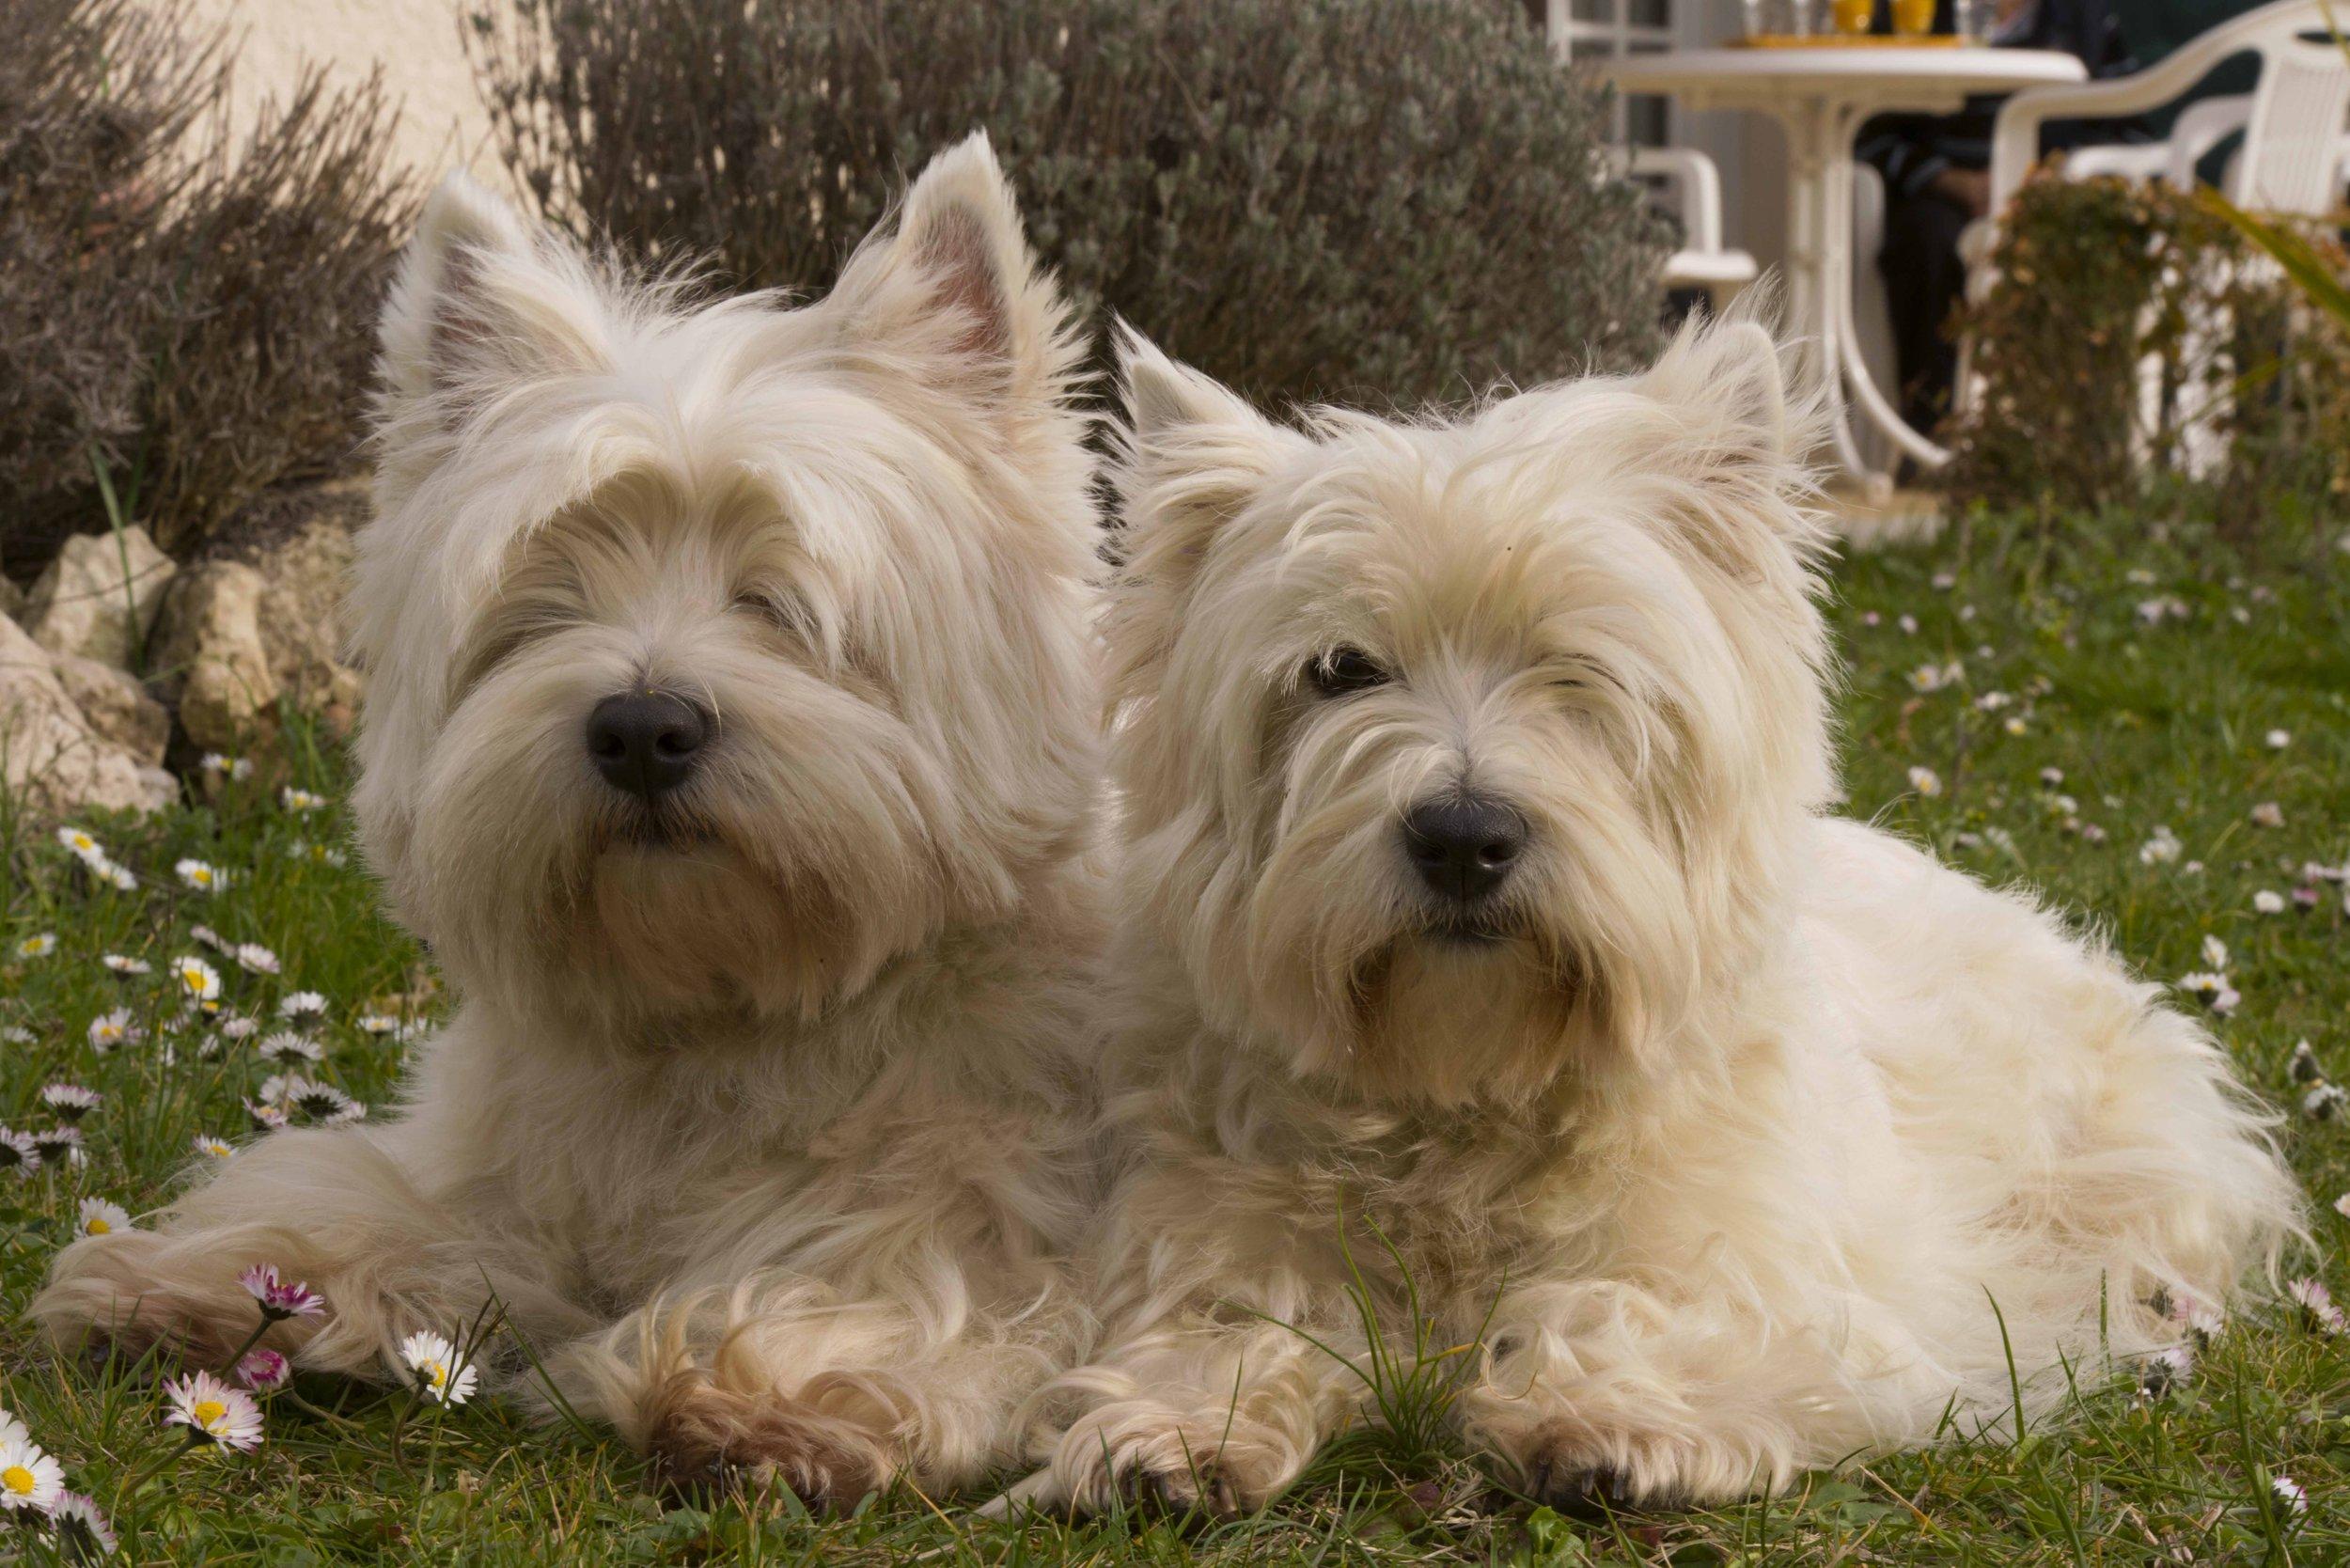 white-dog-mammal-dogs-animals-vertebrate-773652-pxhere.com.jpg